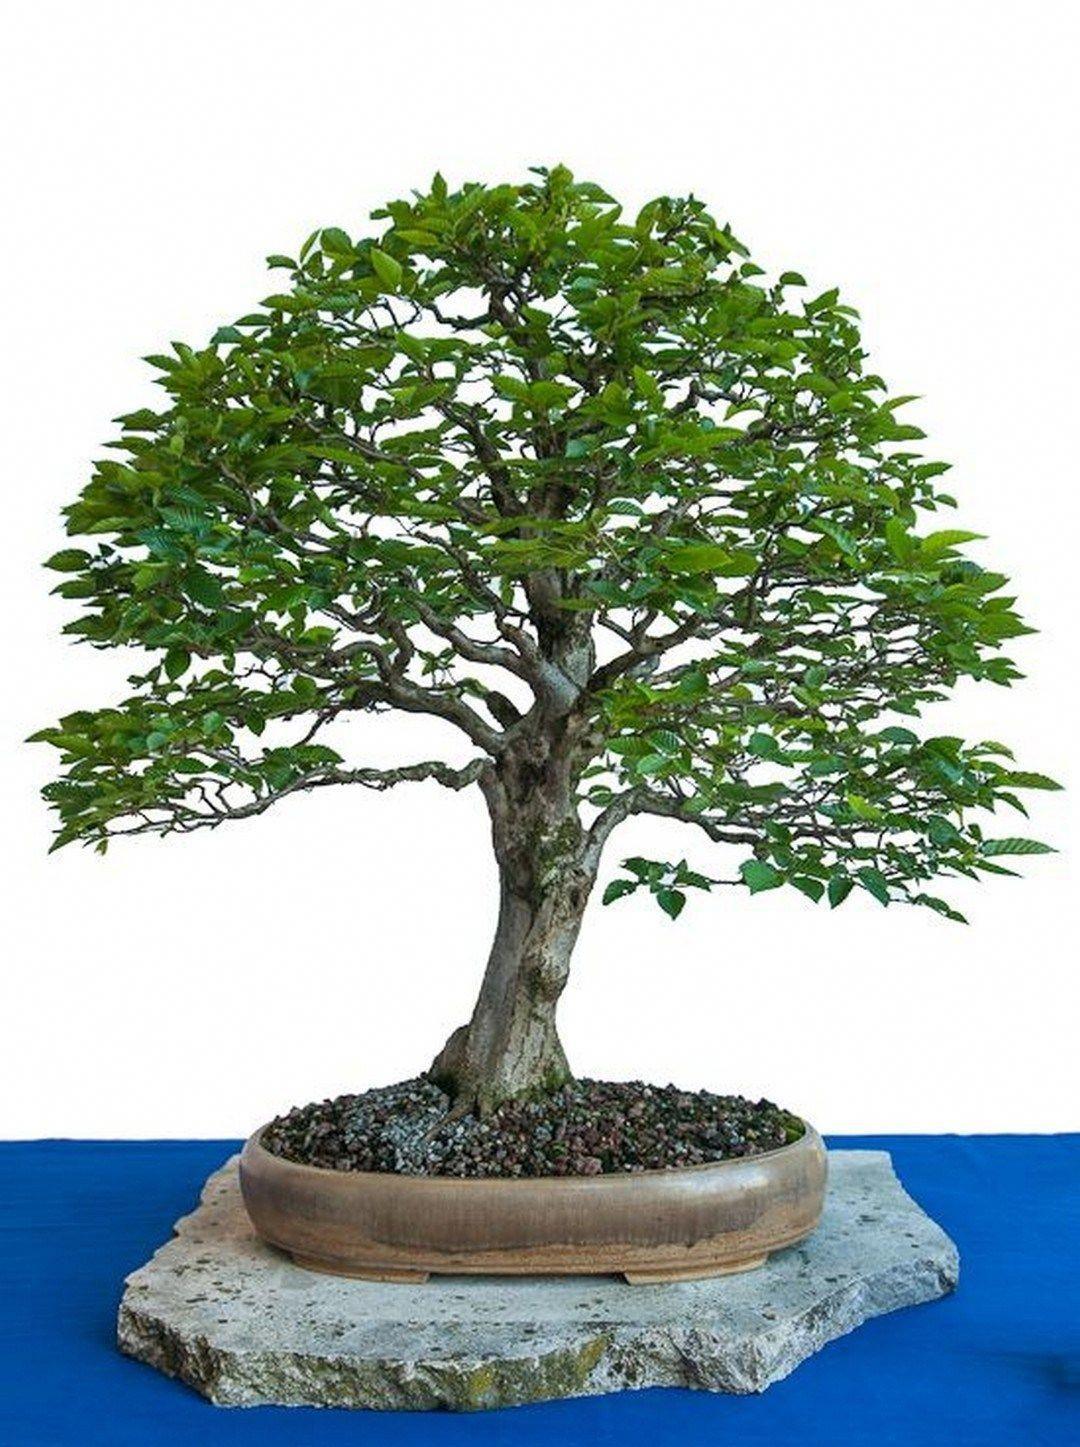 AboutTheBonzaiTree Bonsai tree care, Bonsai tree